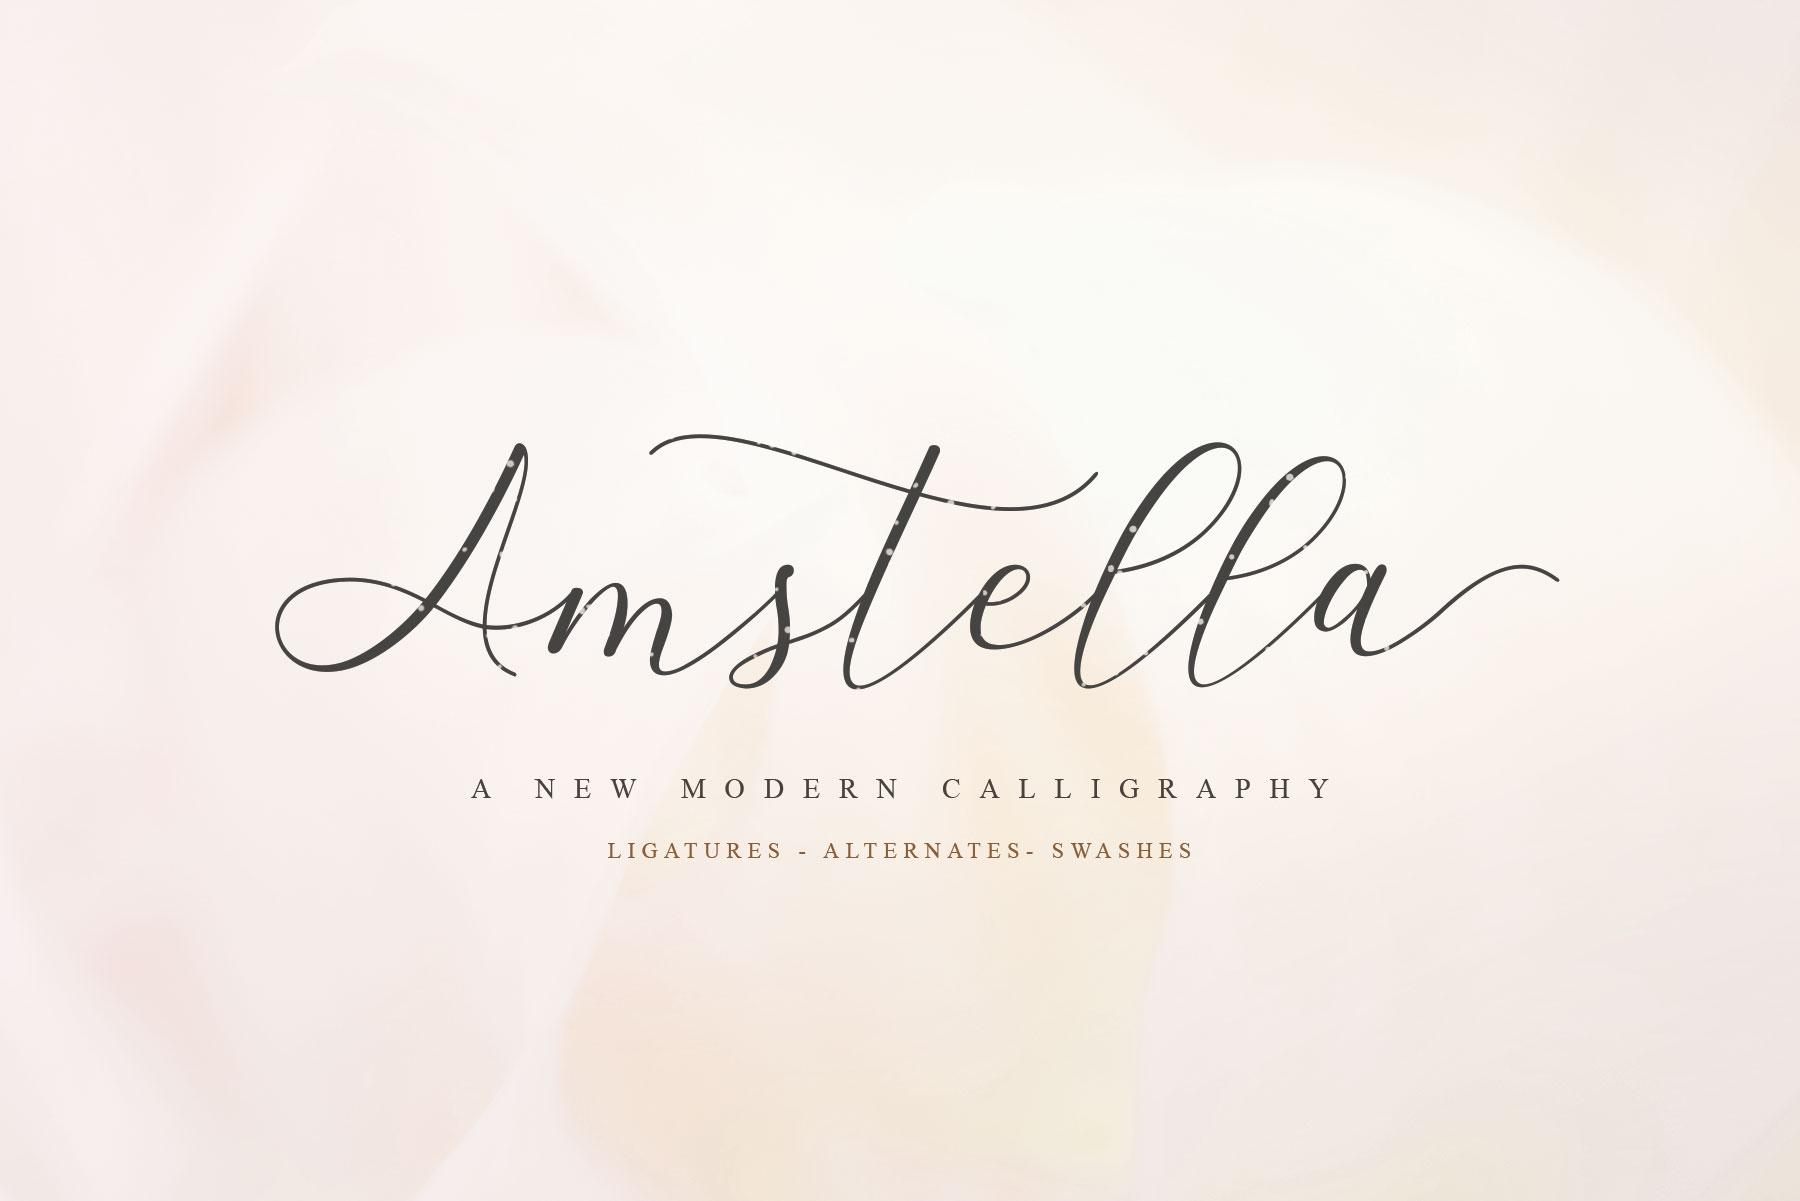 Amstella Modern Calligraphy example image 1